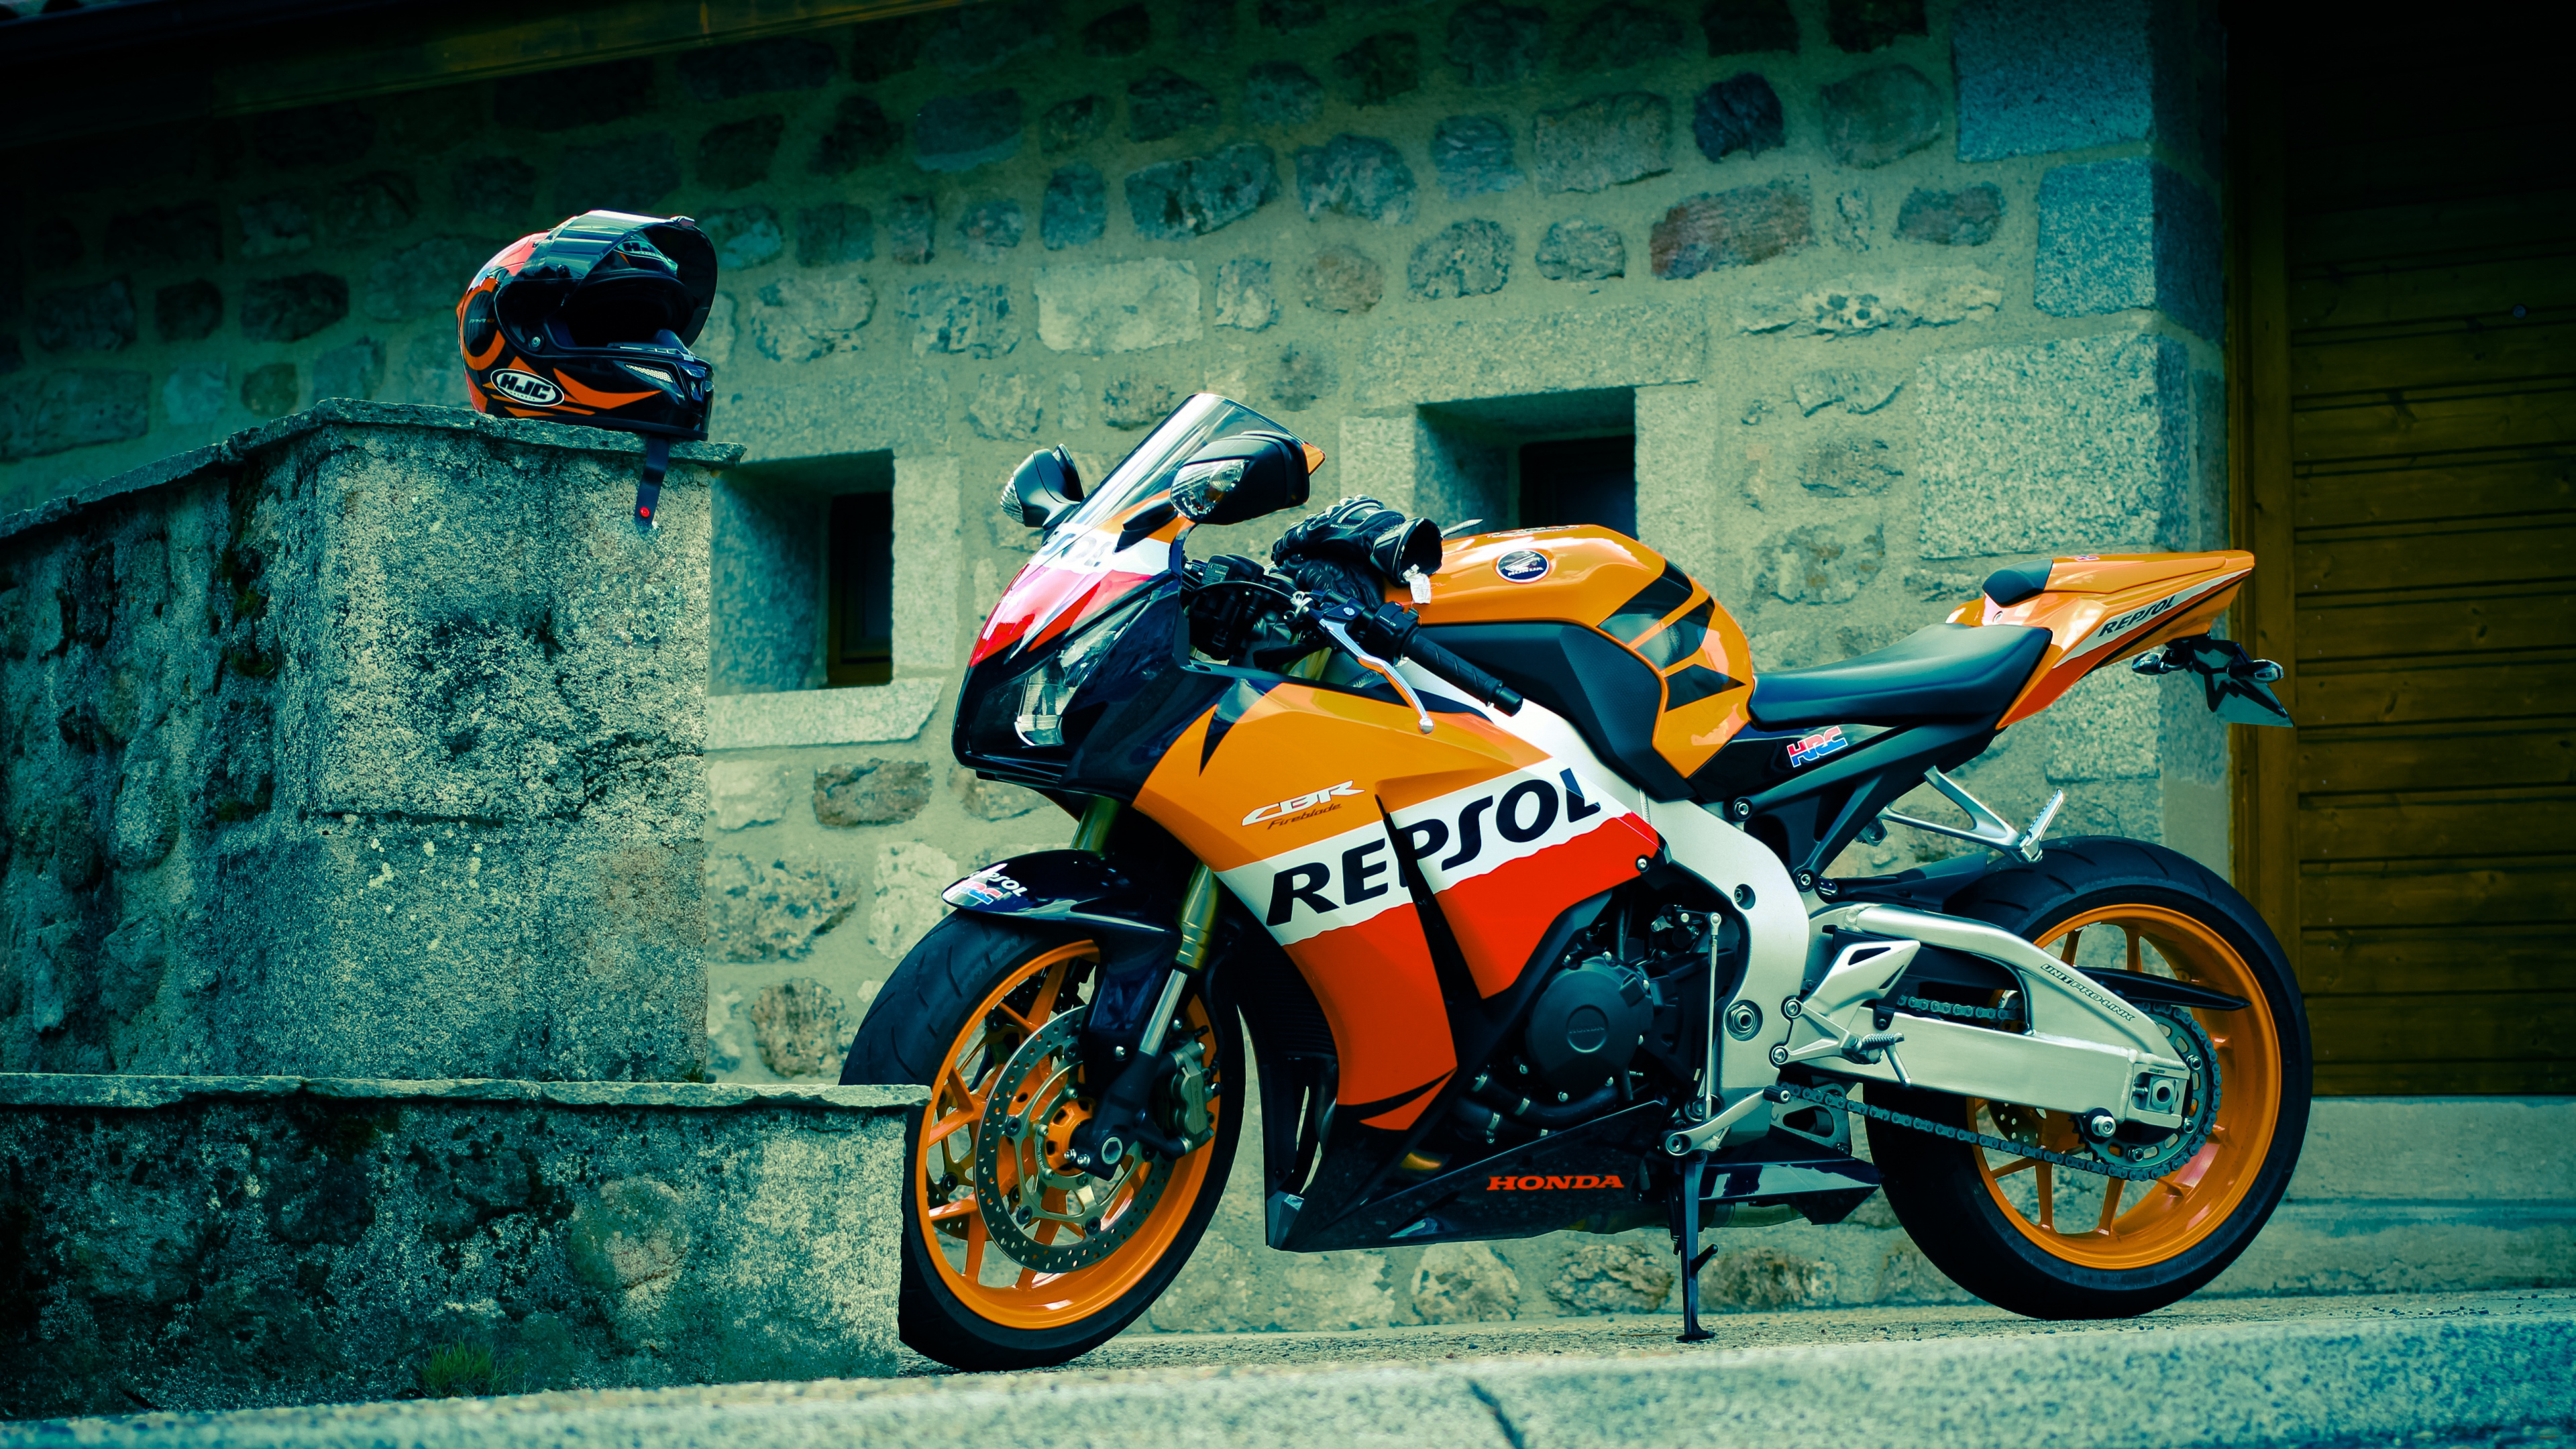 Honda Cbr Repsol HD Bikes 4k Wallpapers Images Backgrounds